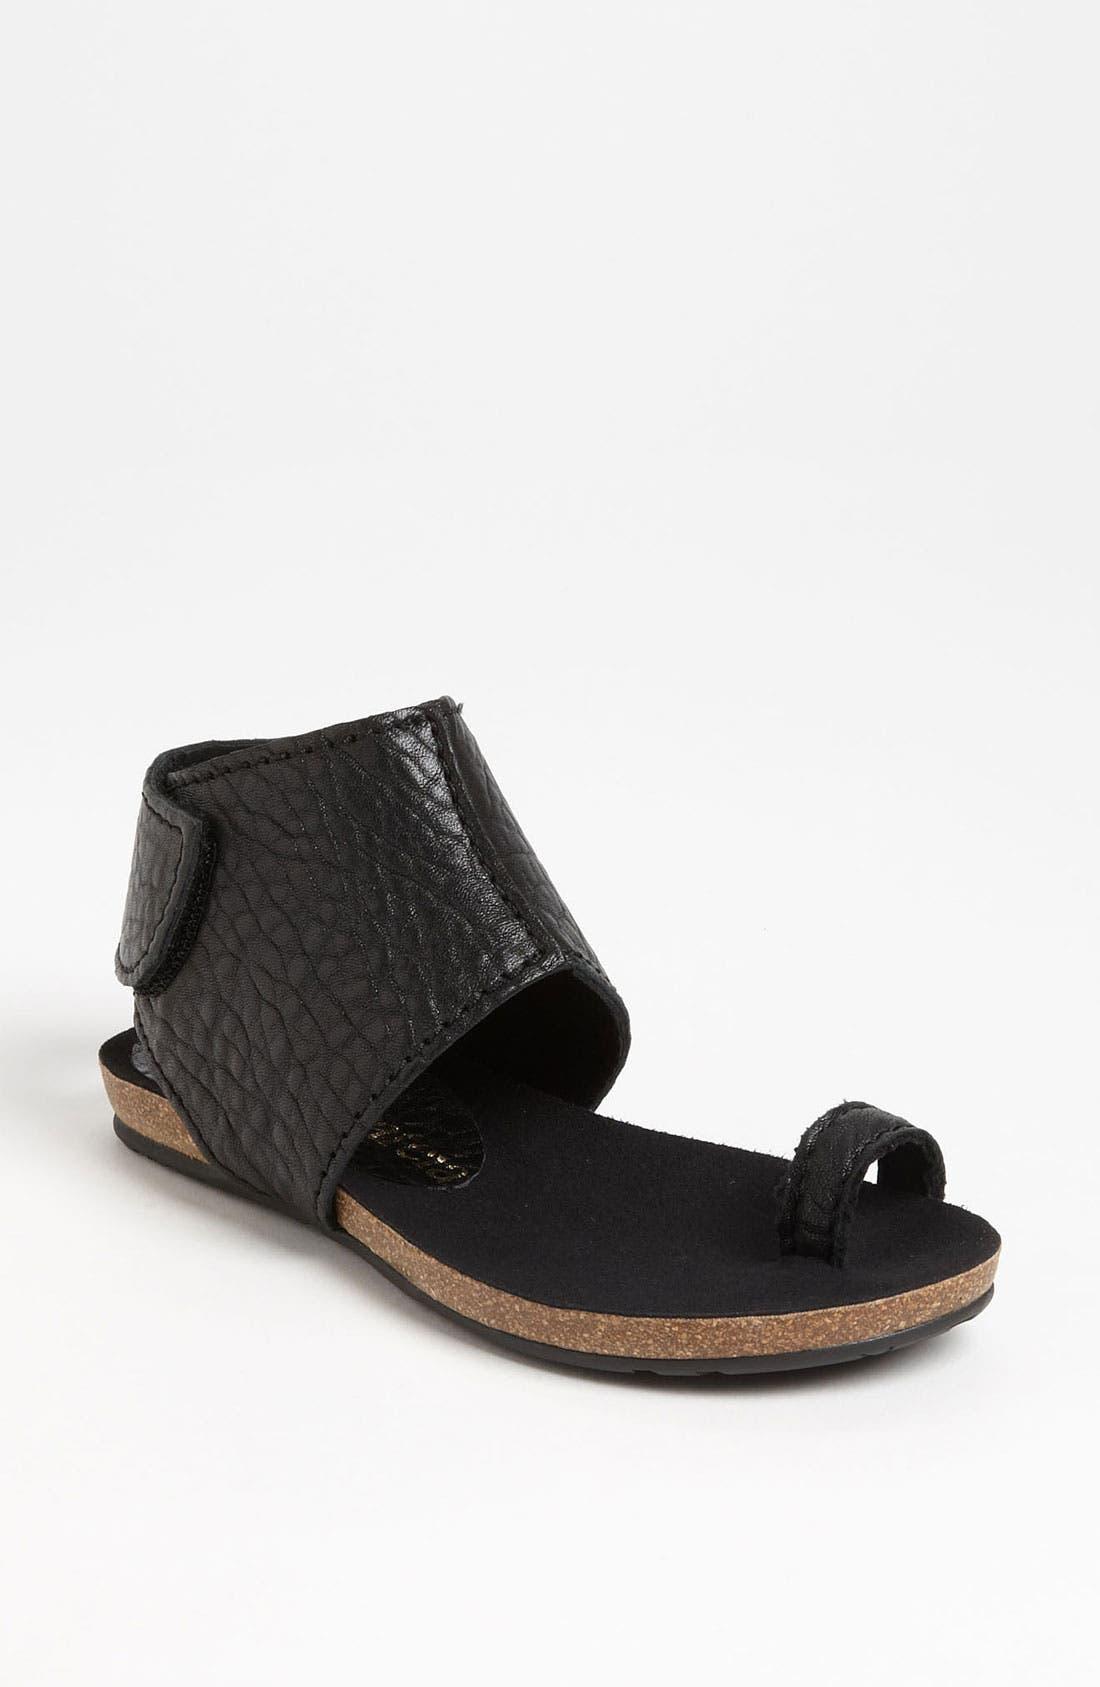 Main Image - Pedro Garcia 'Vania' Flat Sandal